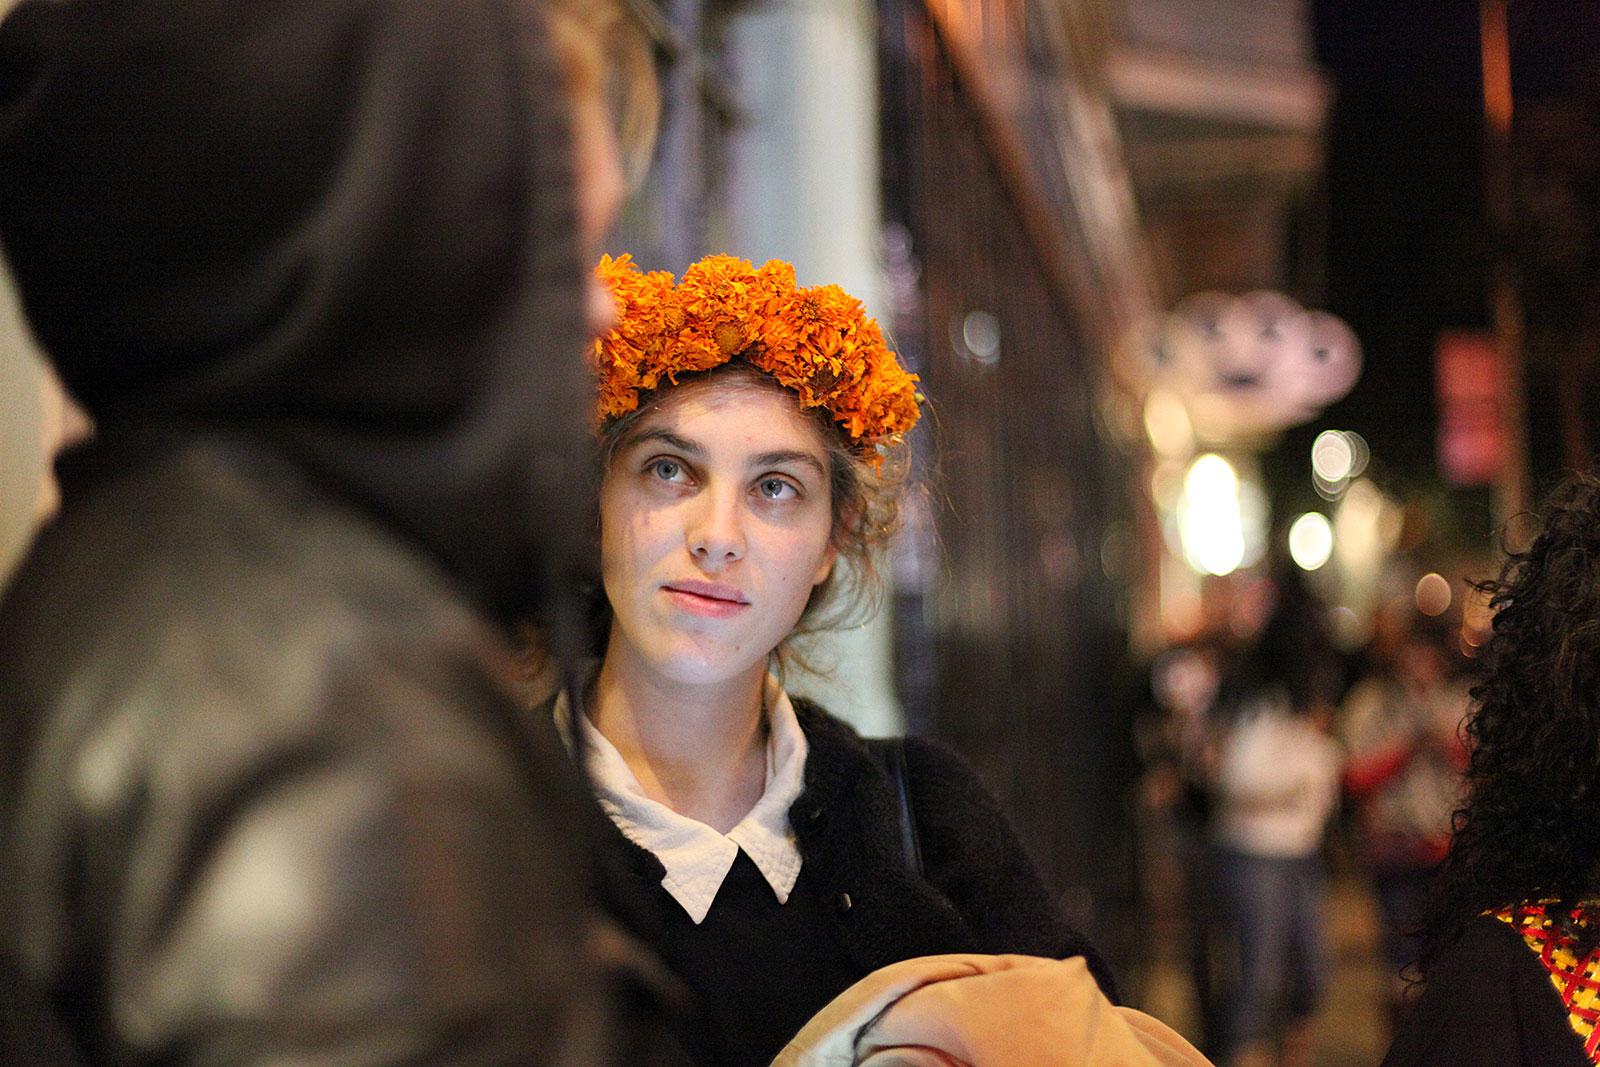 A woman in makeup on 24th Street. Photo by Hélène Goupil